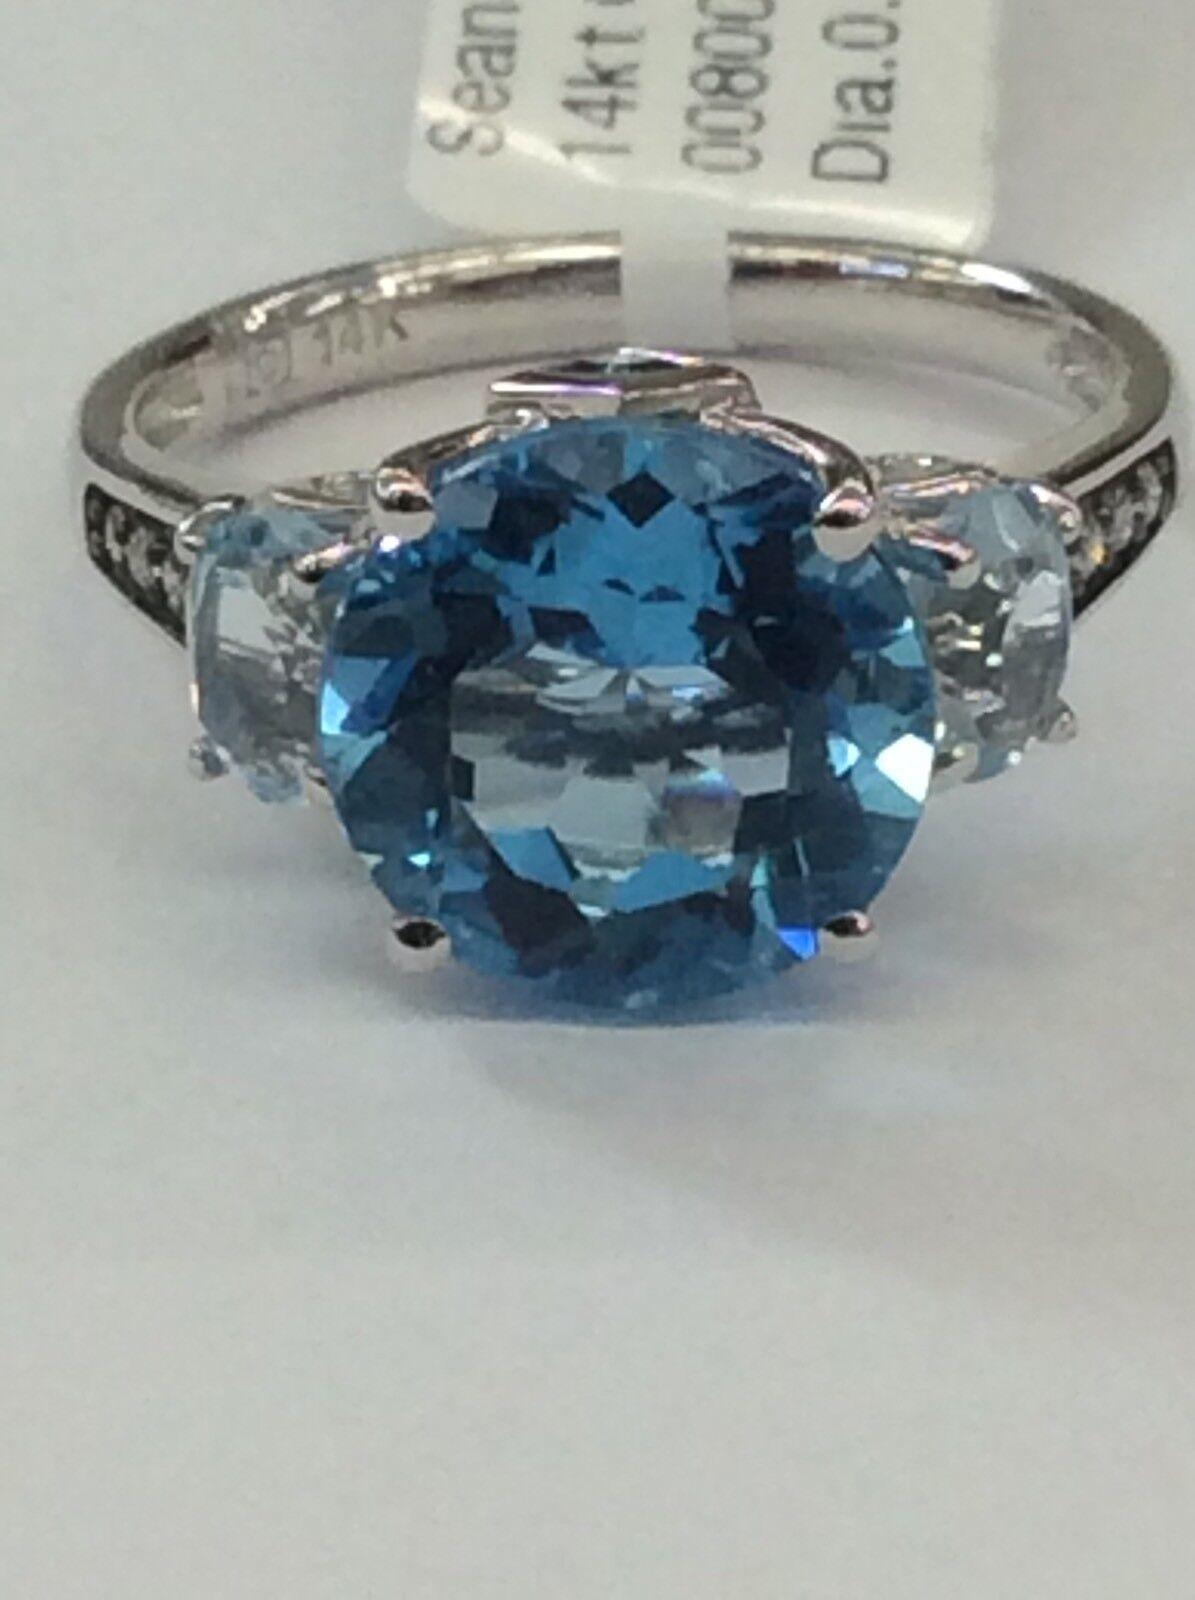 14 Kt White Gold 2.5 cts Swiss Blue Topaz and Diamond Pendant P8568